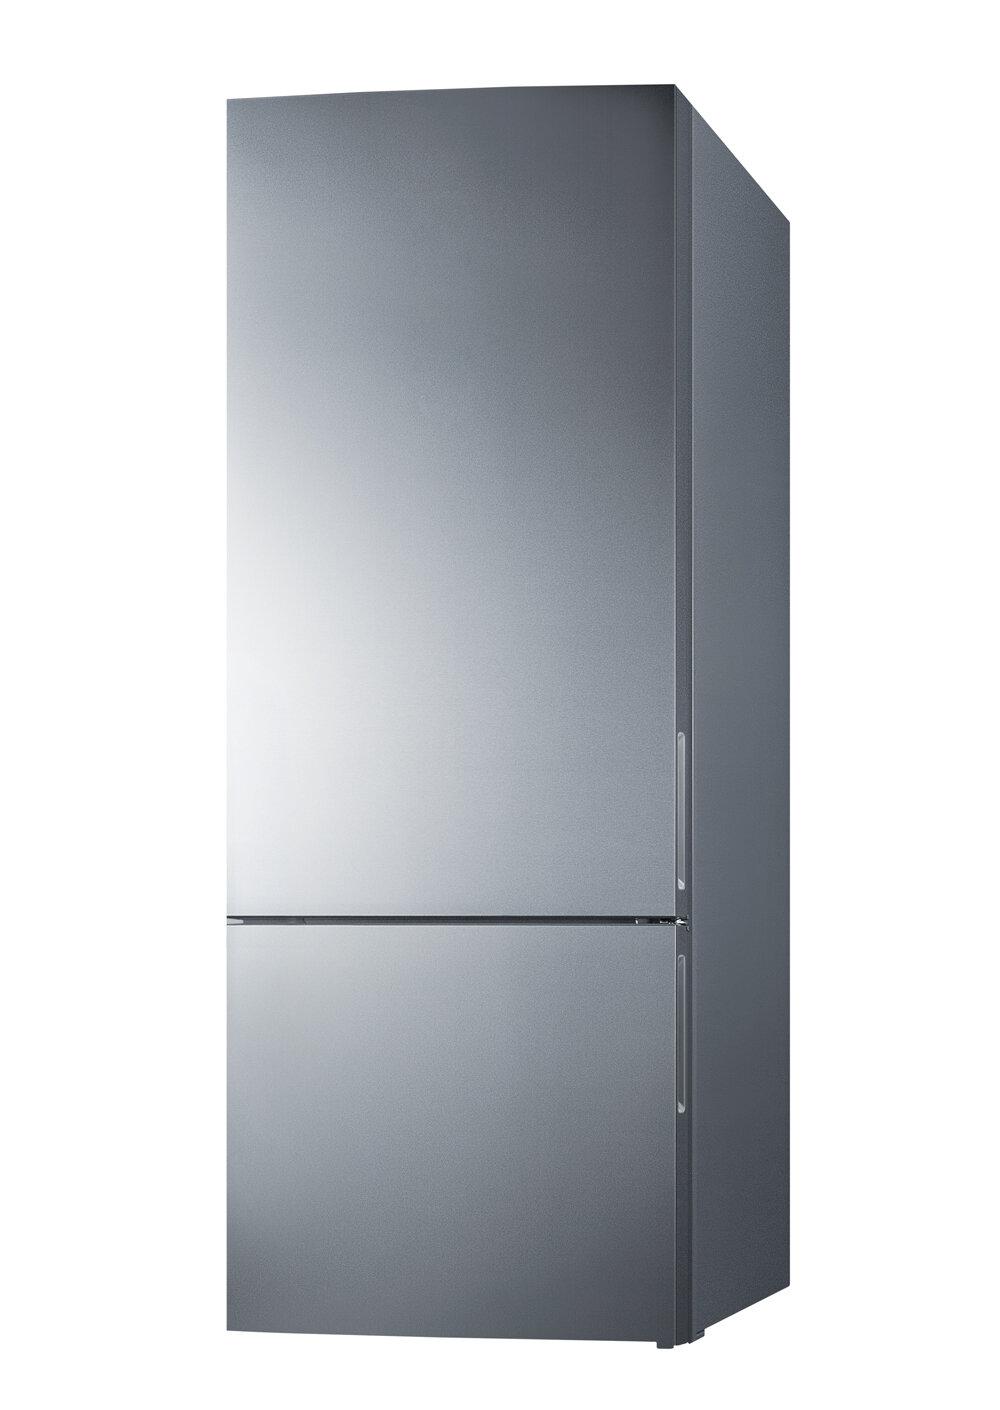 Thin Line 14 8 Cu Ft Energy Star Counter Depth Bottom Freezer Refrigerator With Led Lighting